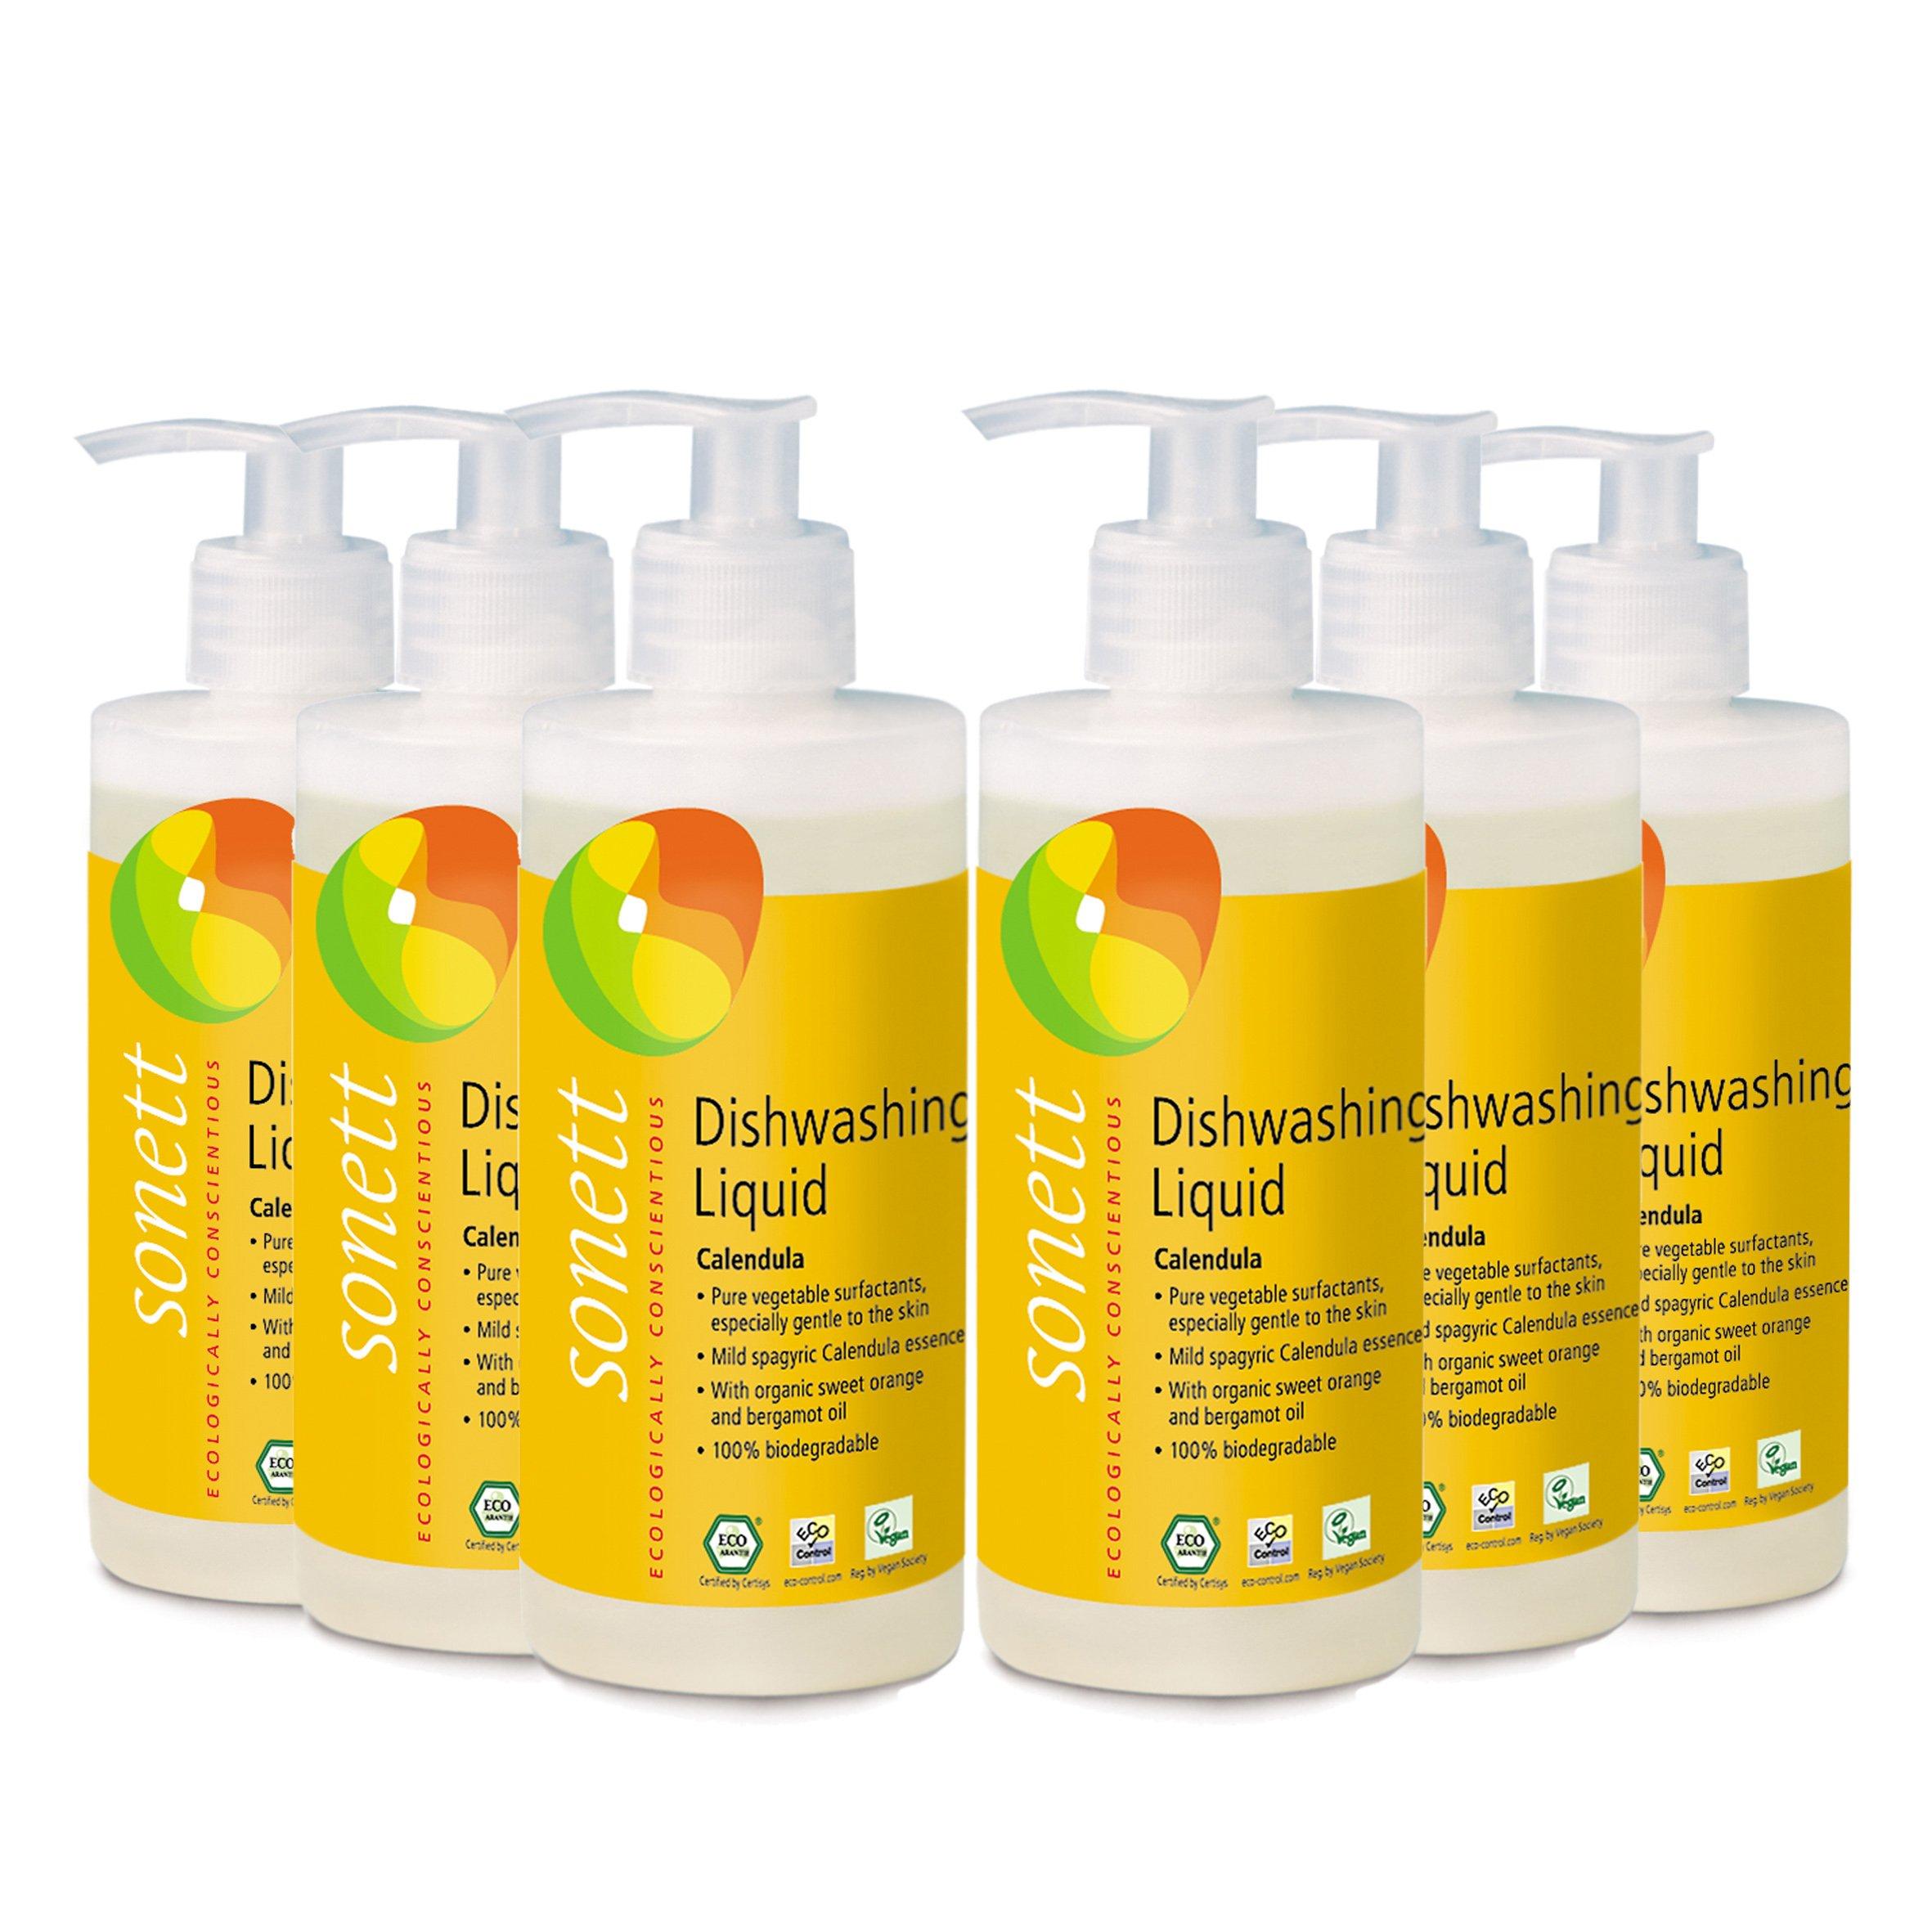 Sonett Organic Dishwashing Liquid Calendula, Lemon 10 oz and 33.8 oz (Calendula, 10 Fl.Oz (6 Count))